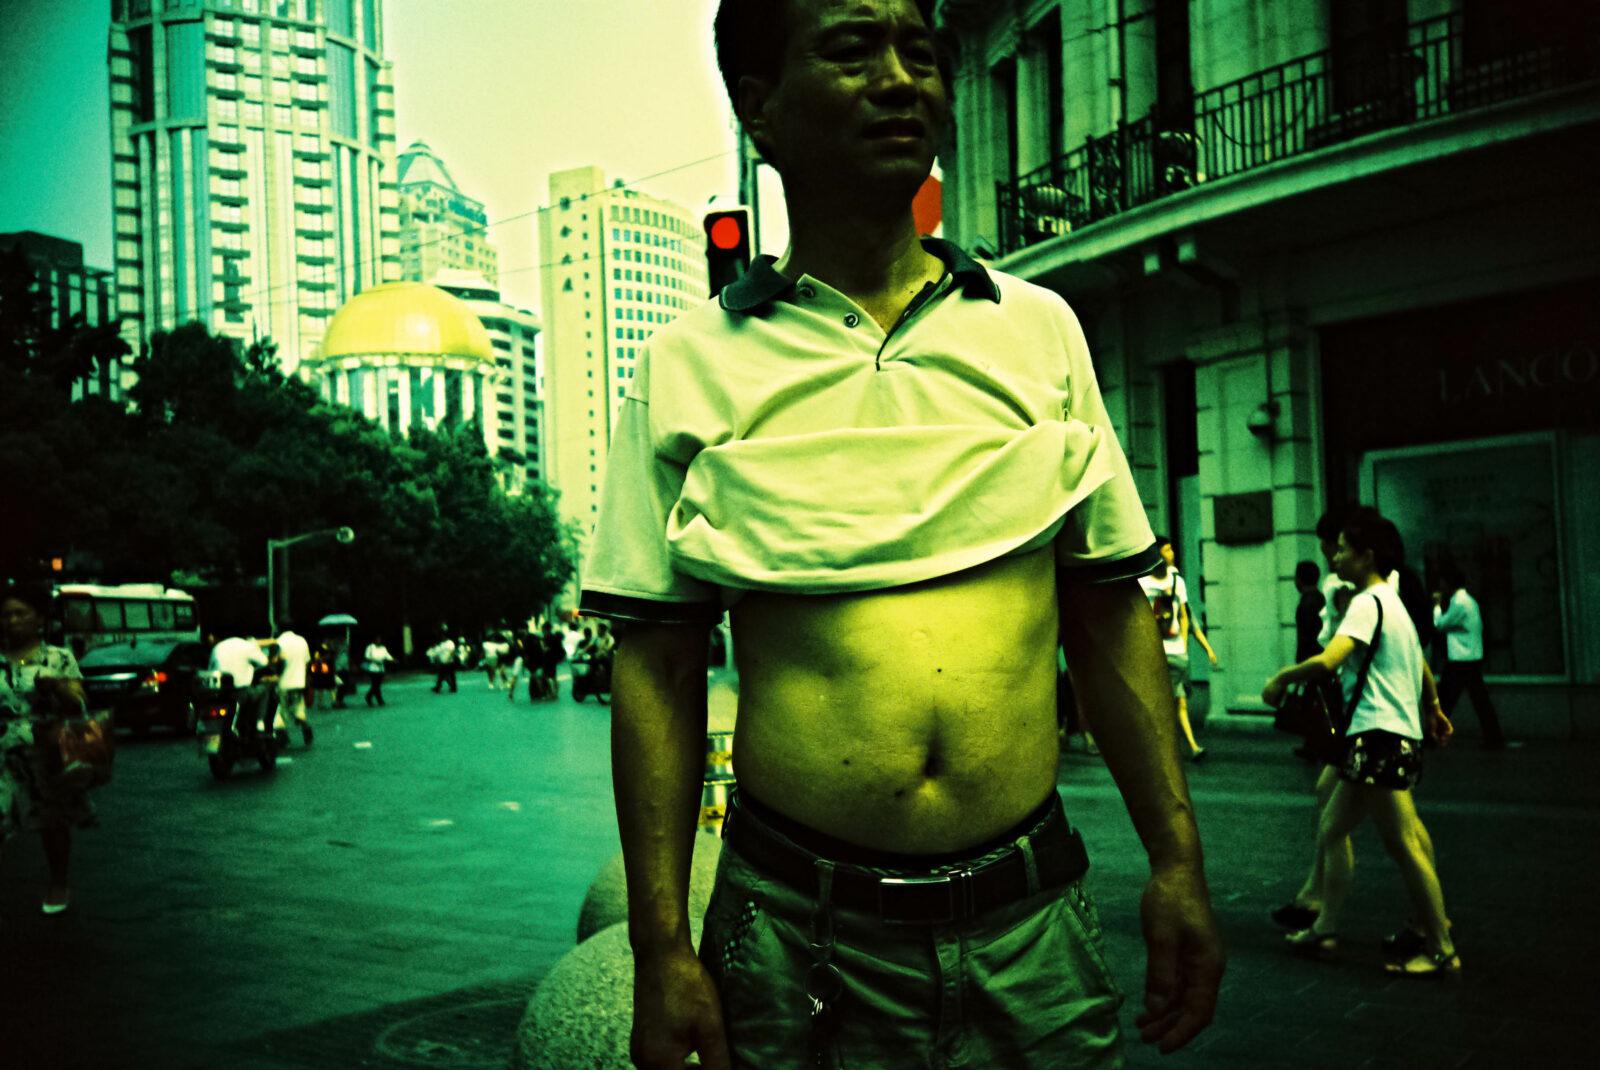 instaCDV 15 China roll15 Shanghai Mapplethorpe 000025